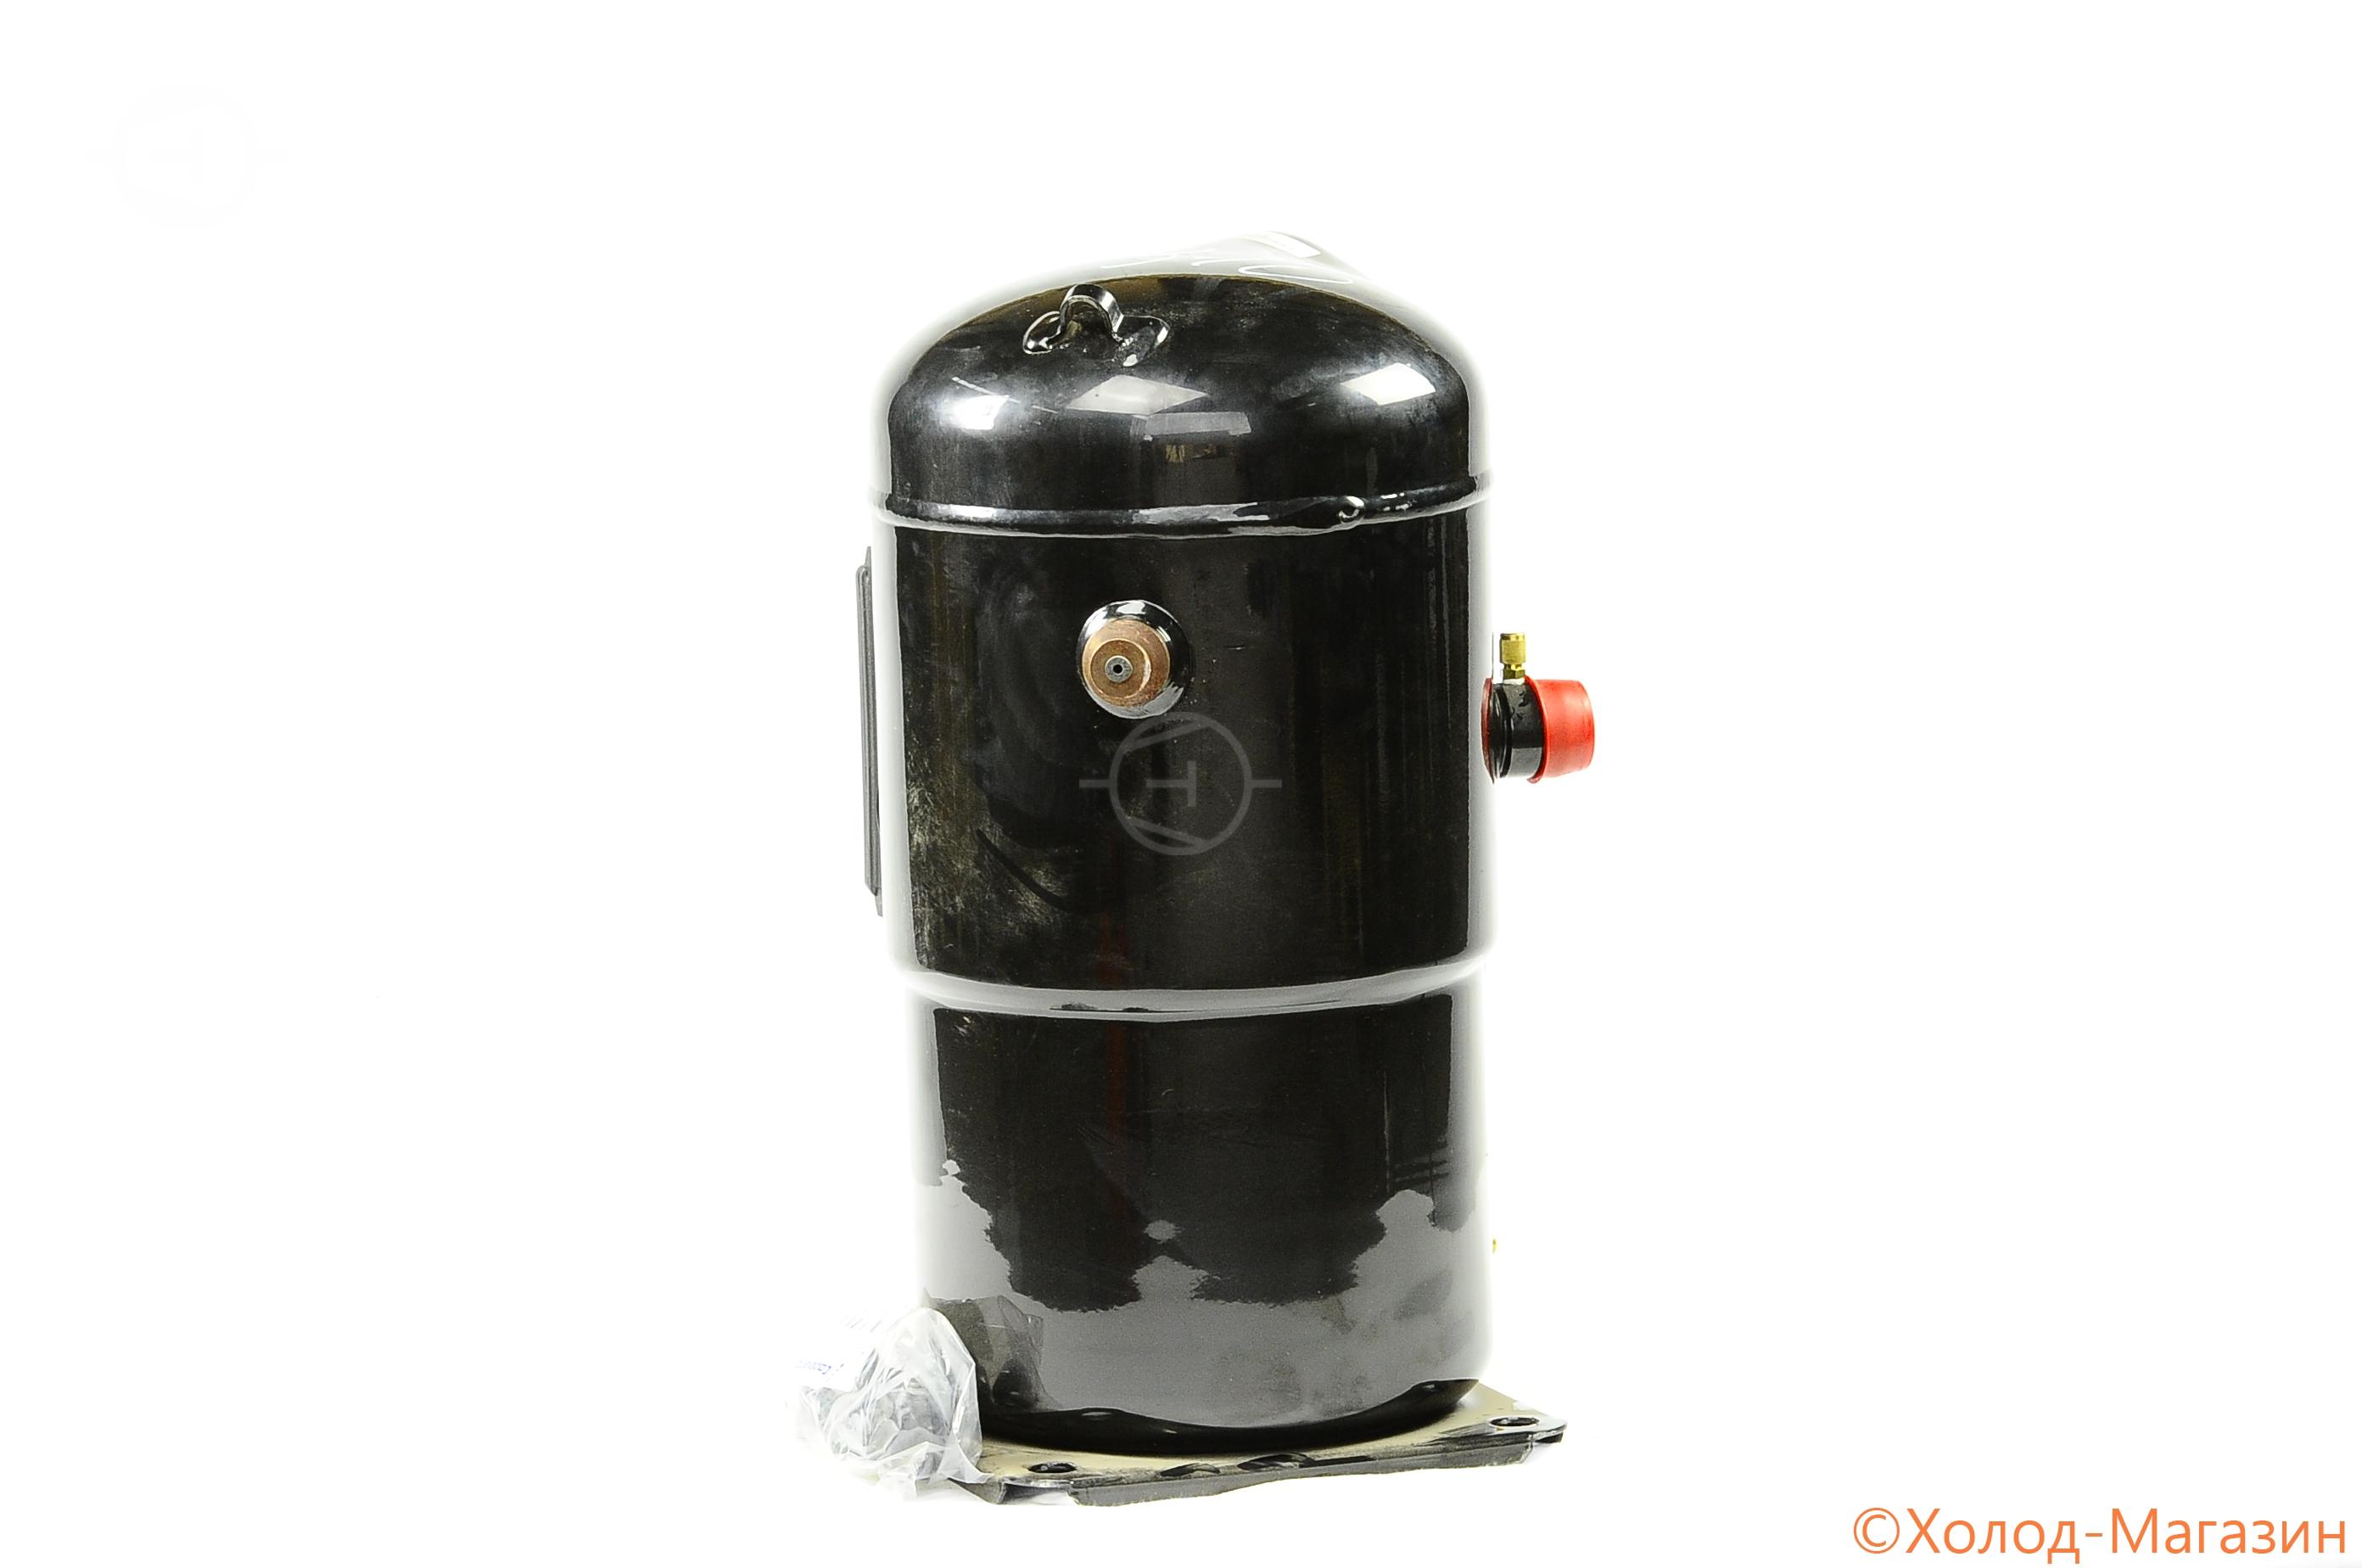 Компрессор спиральный ZF 40 K4E-TWD-551 Copeland, Emerson